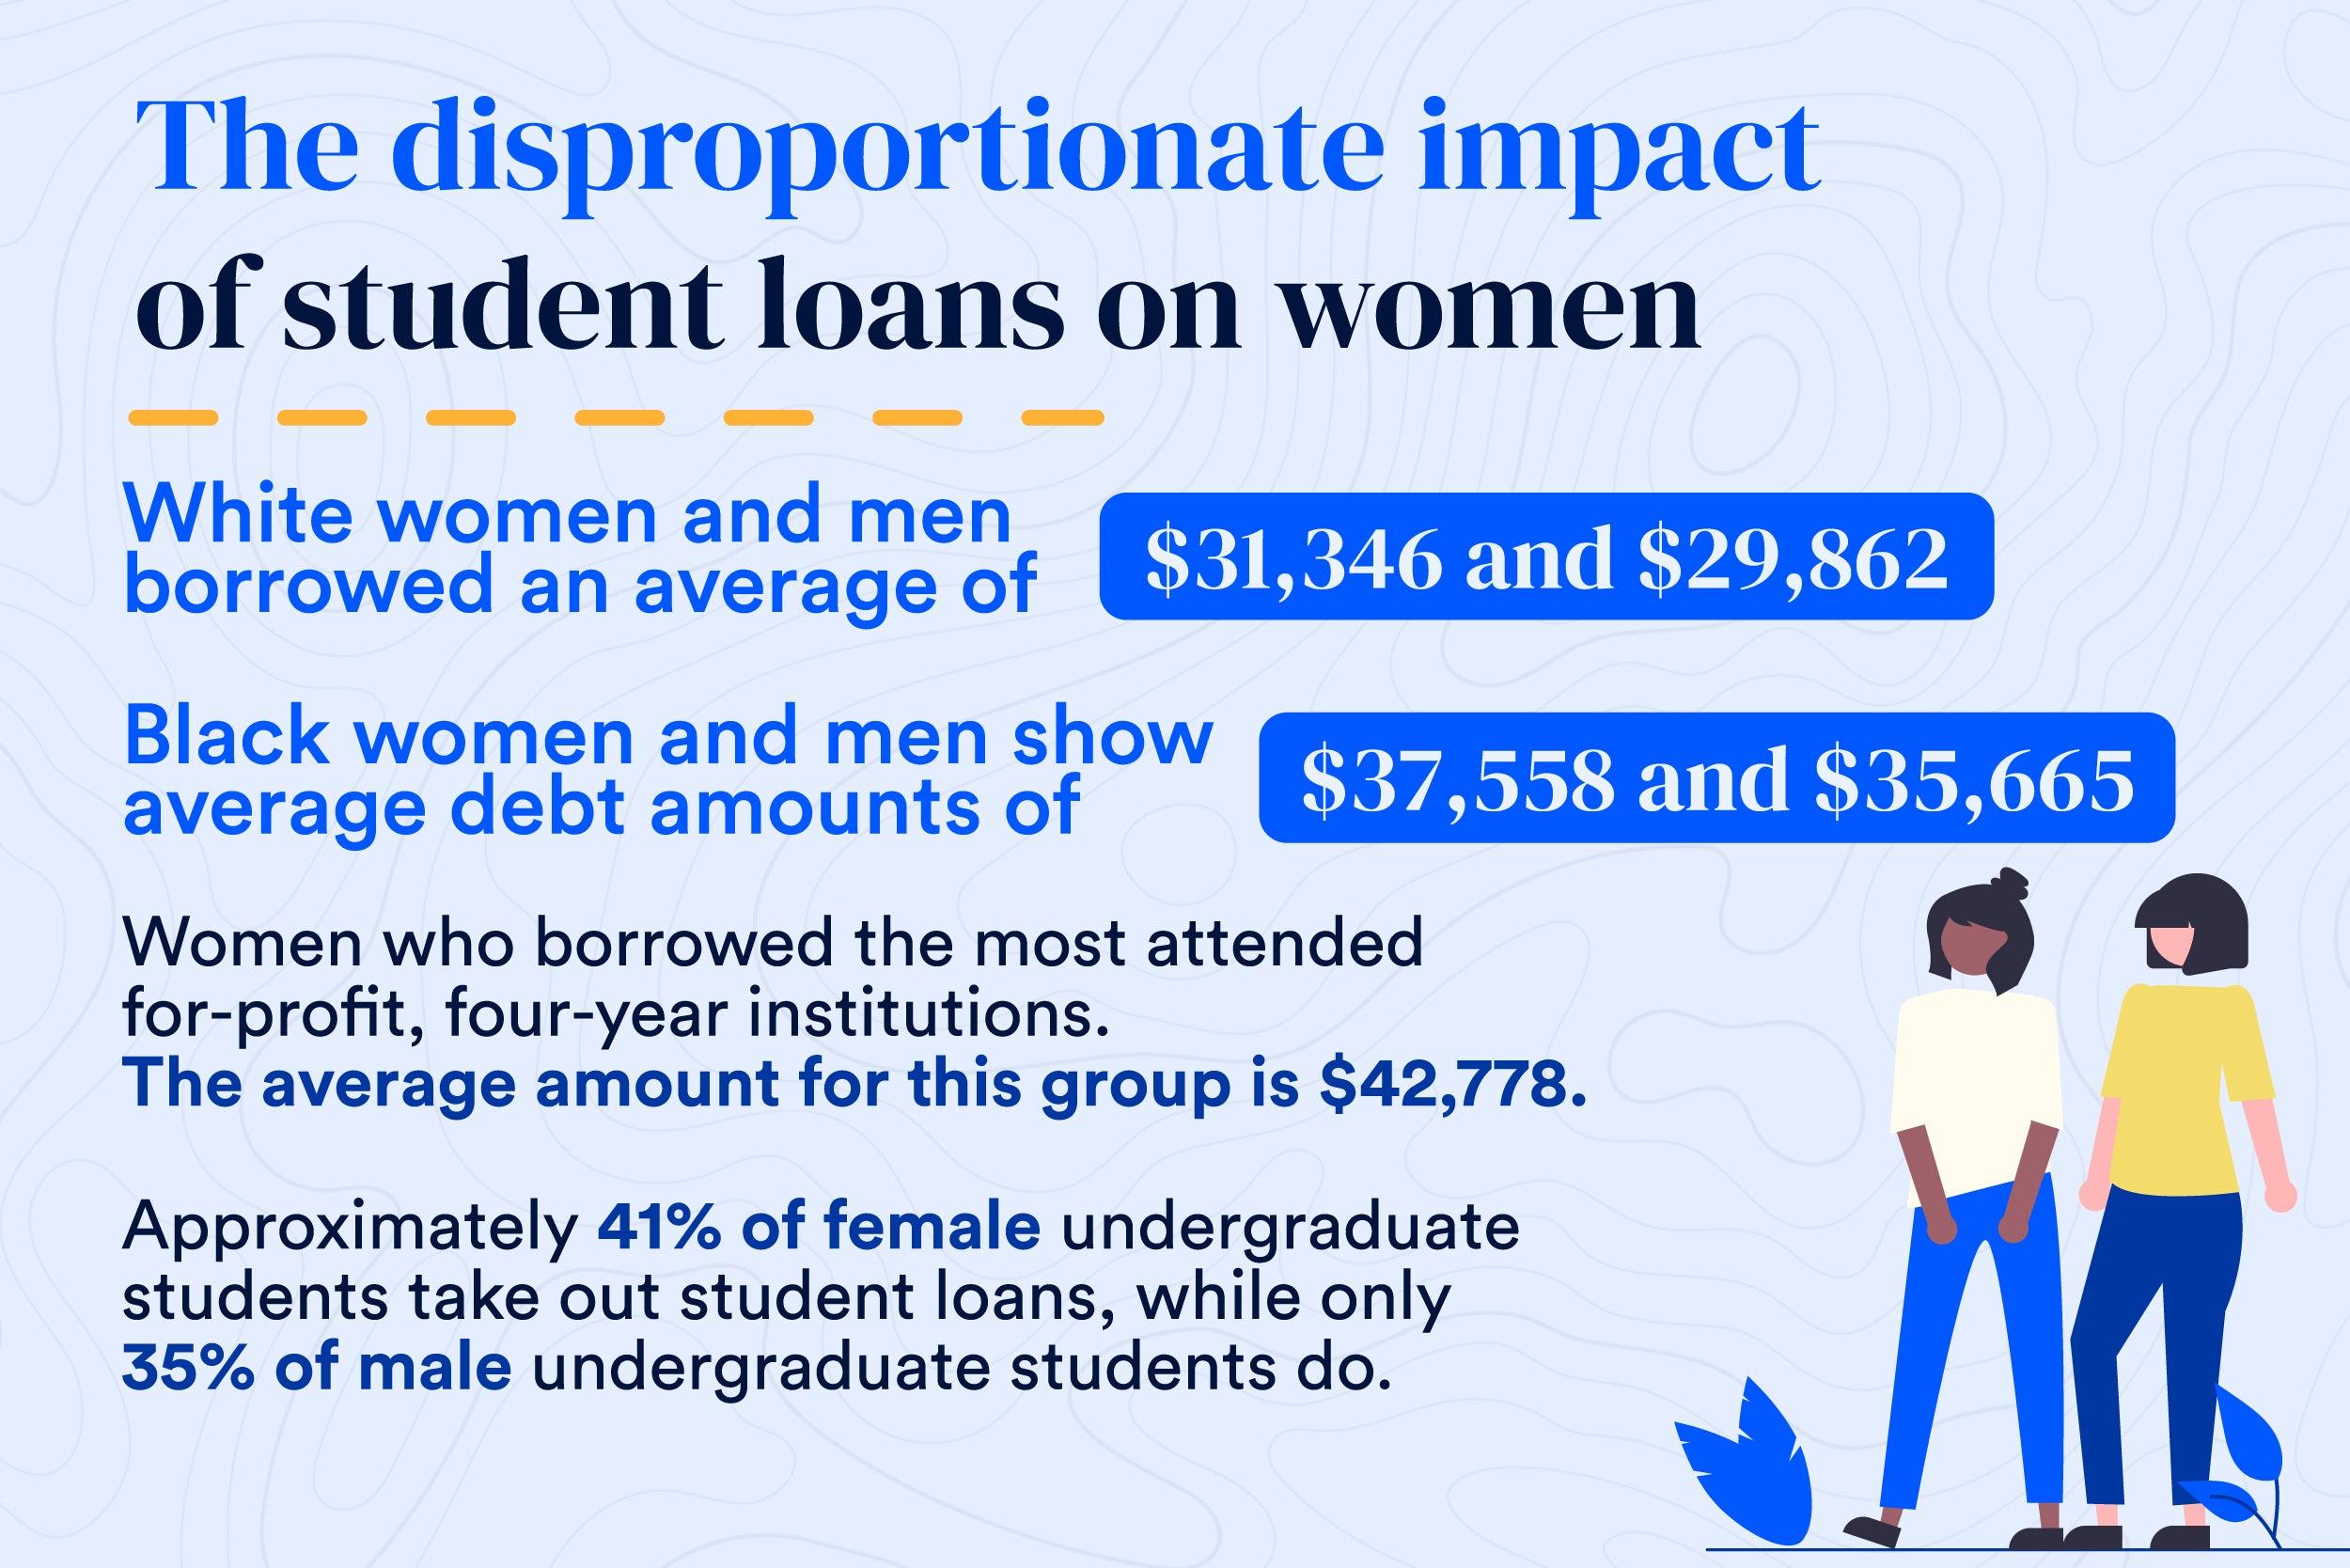 Graphic explaining that women carry more student loan debt than men